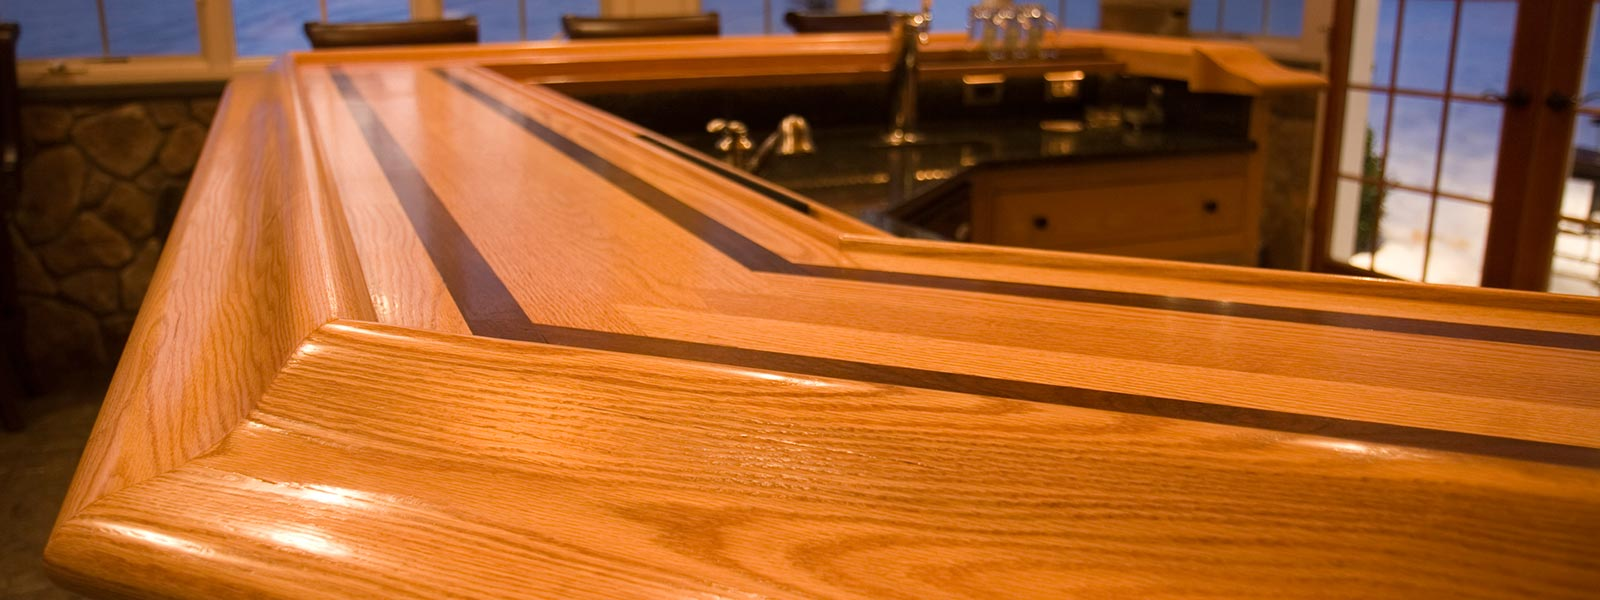 kellogg hardwood lumber cabinet grade lumber kellogg hardwood lumber. Black Bedroom Furniture Sets. Home Design Ideas